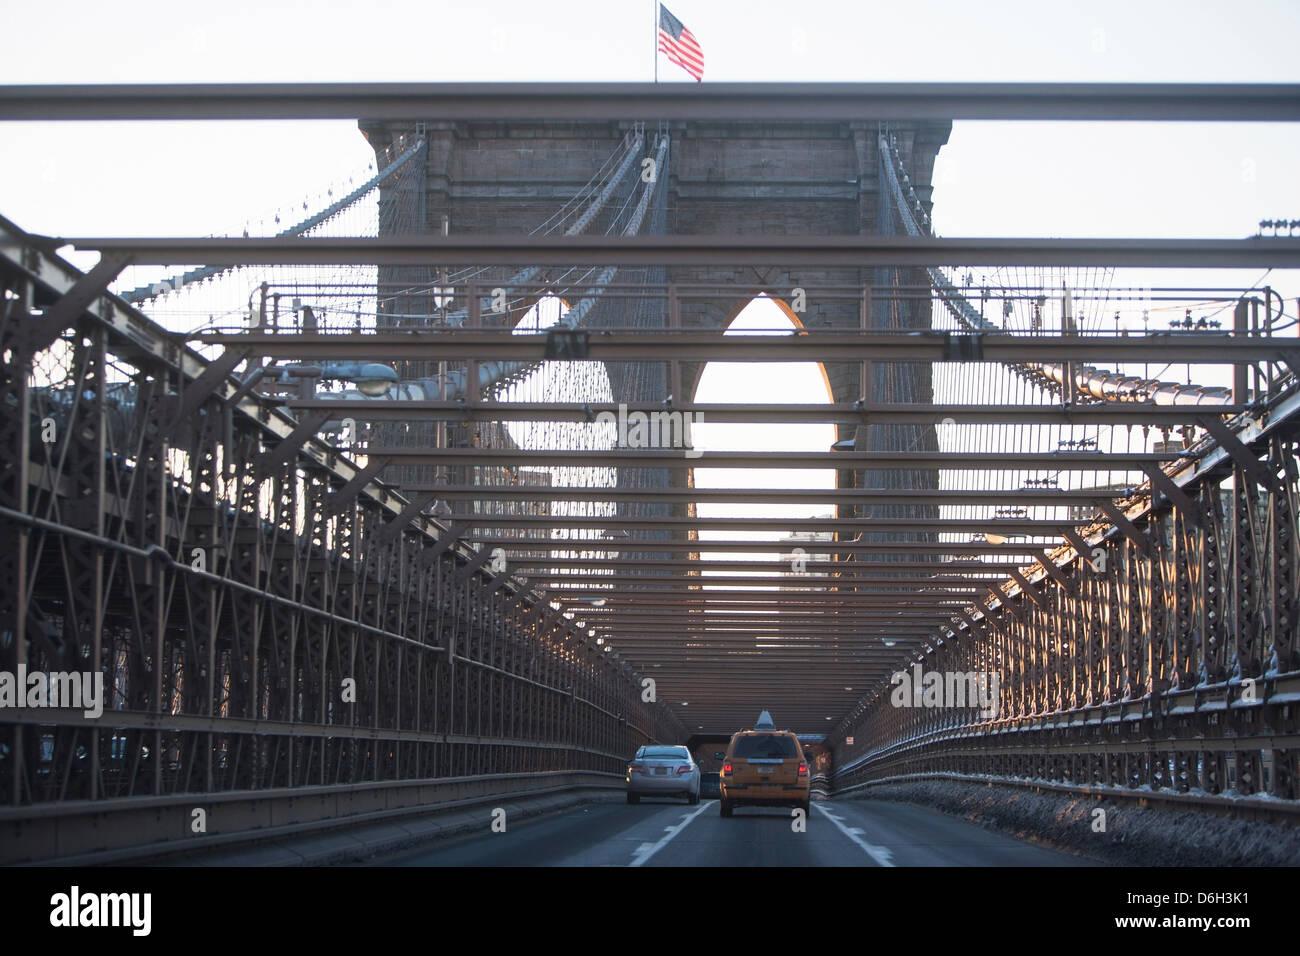 Cars driving on brooklyn bridge stock photo royalty free for Motor vehicle in brooklyn